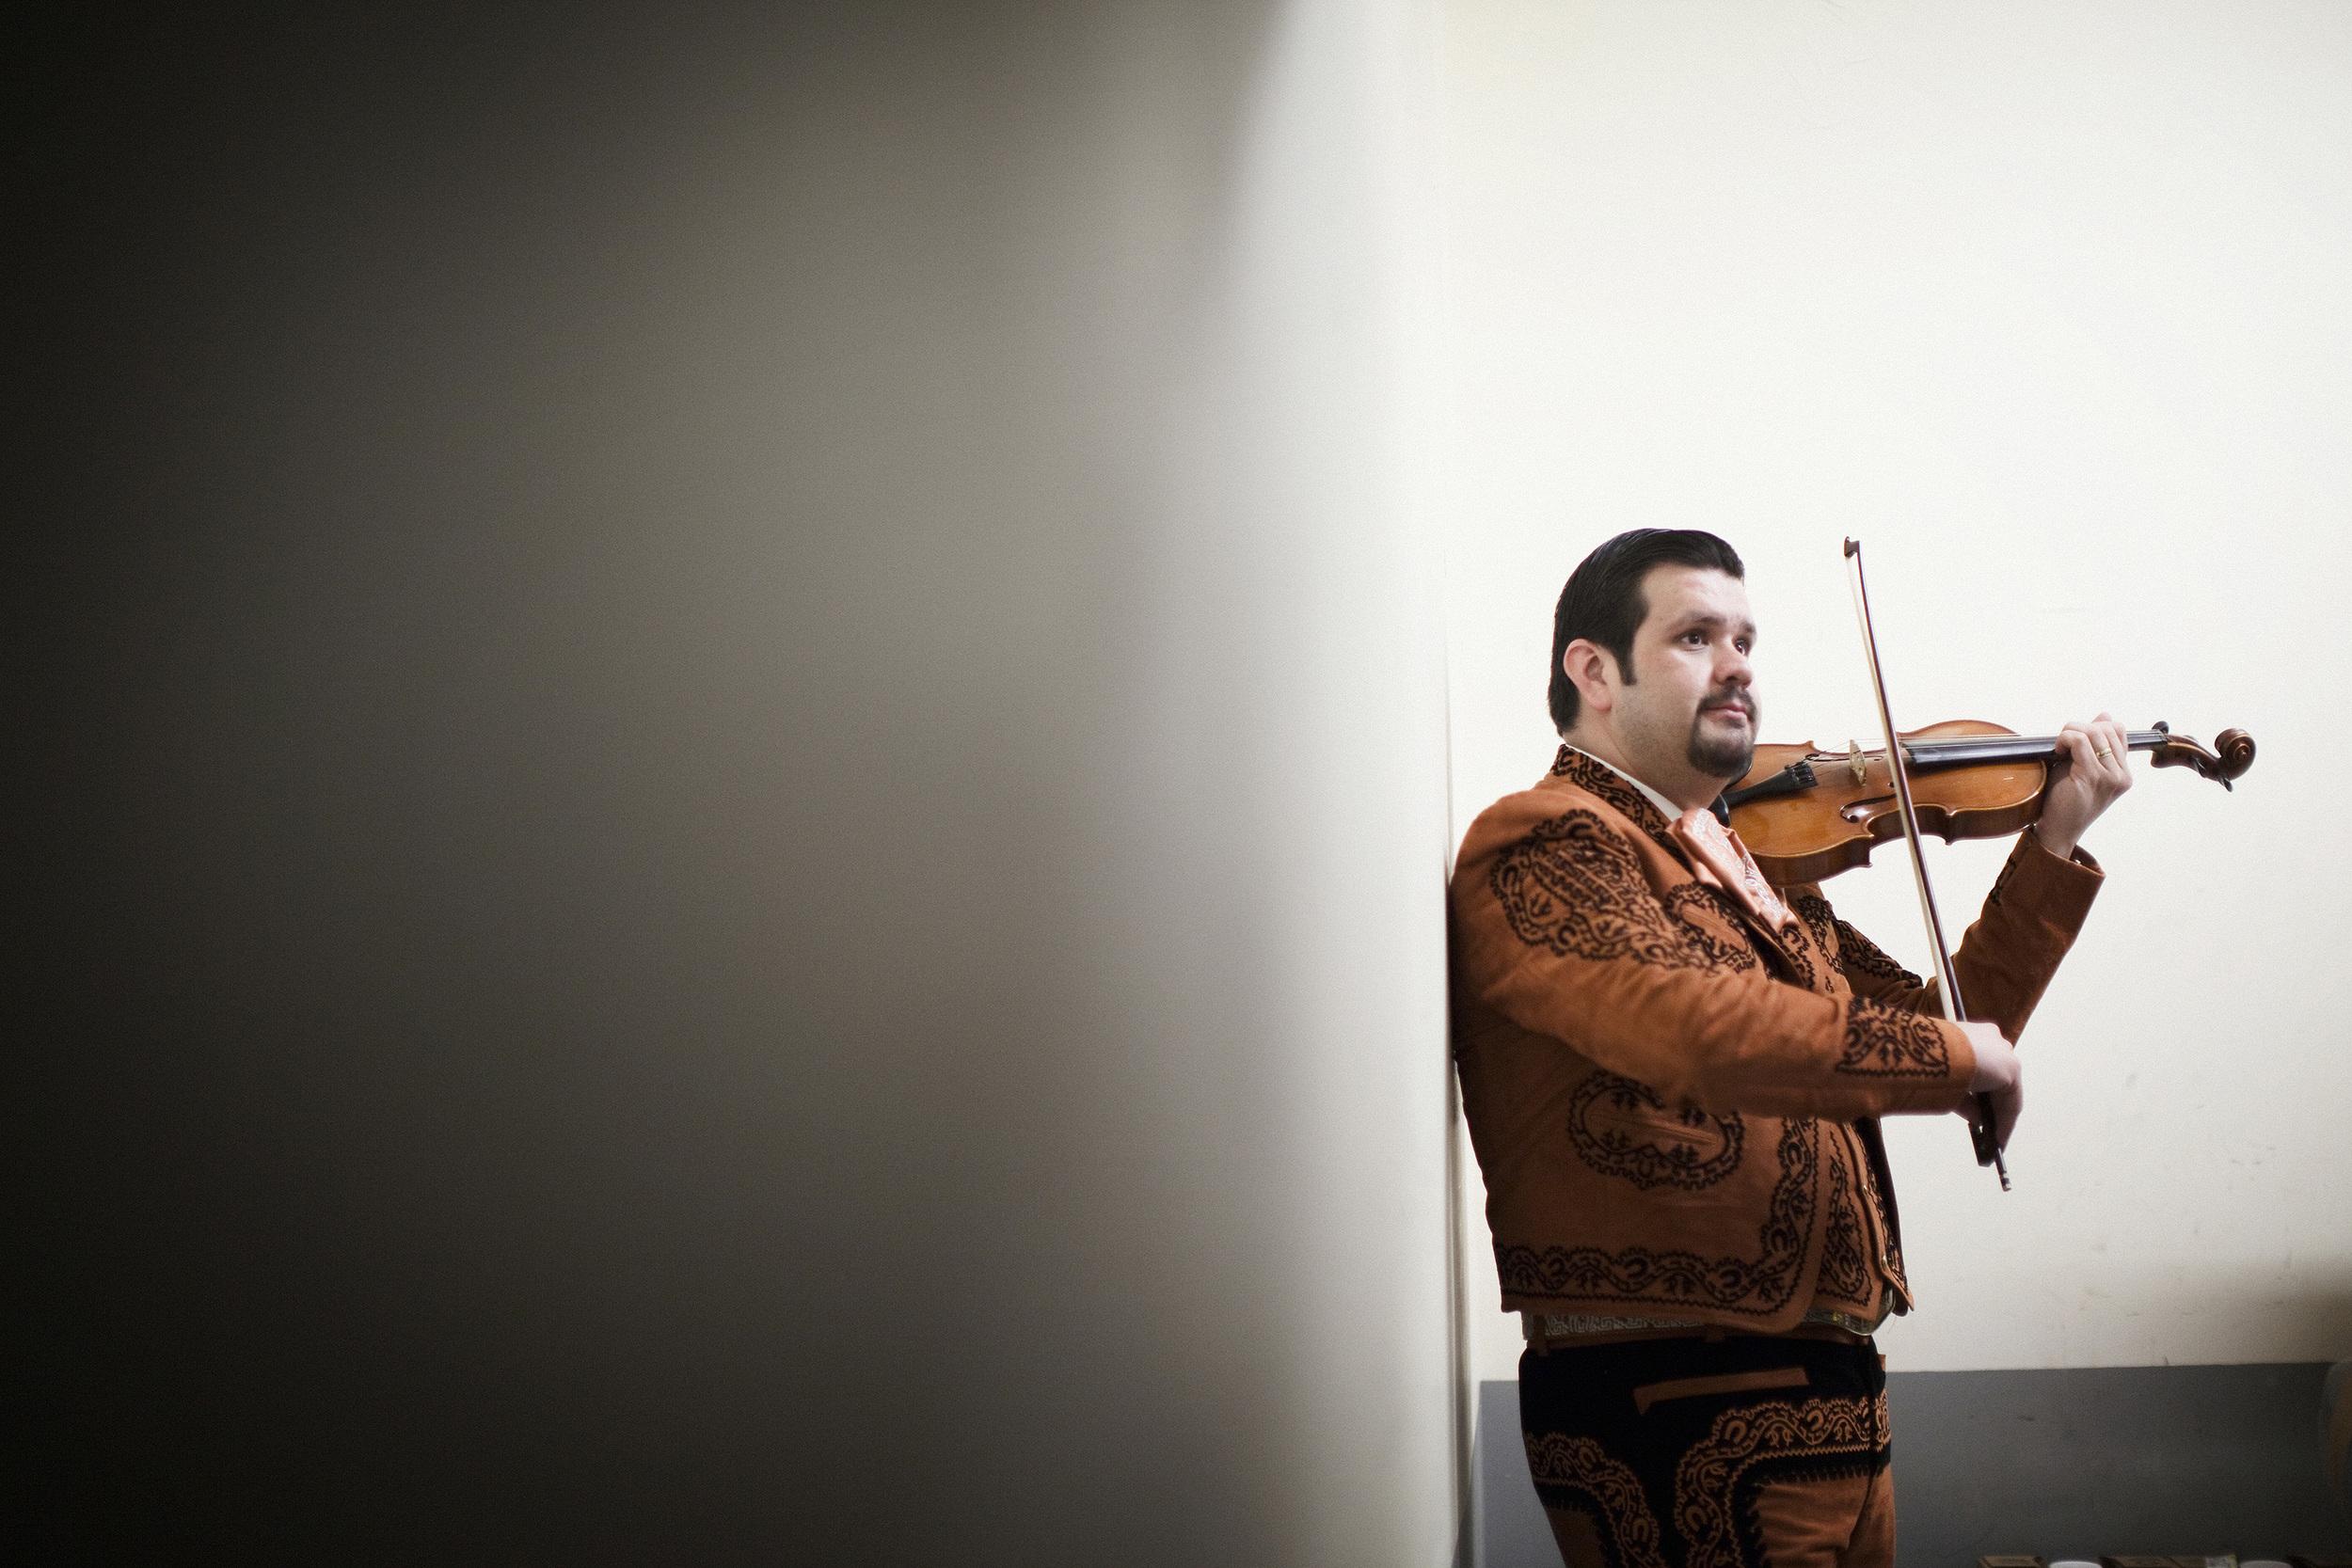 mariachis-day2-0902.jpg